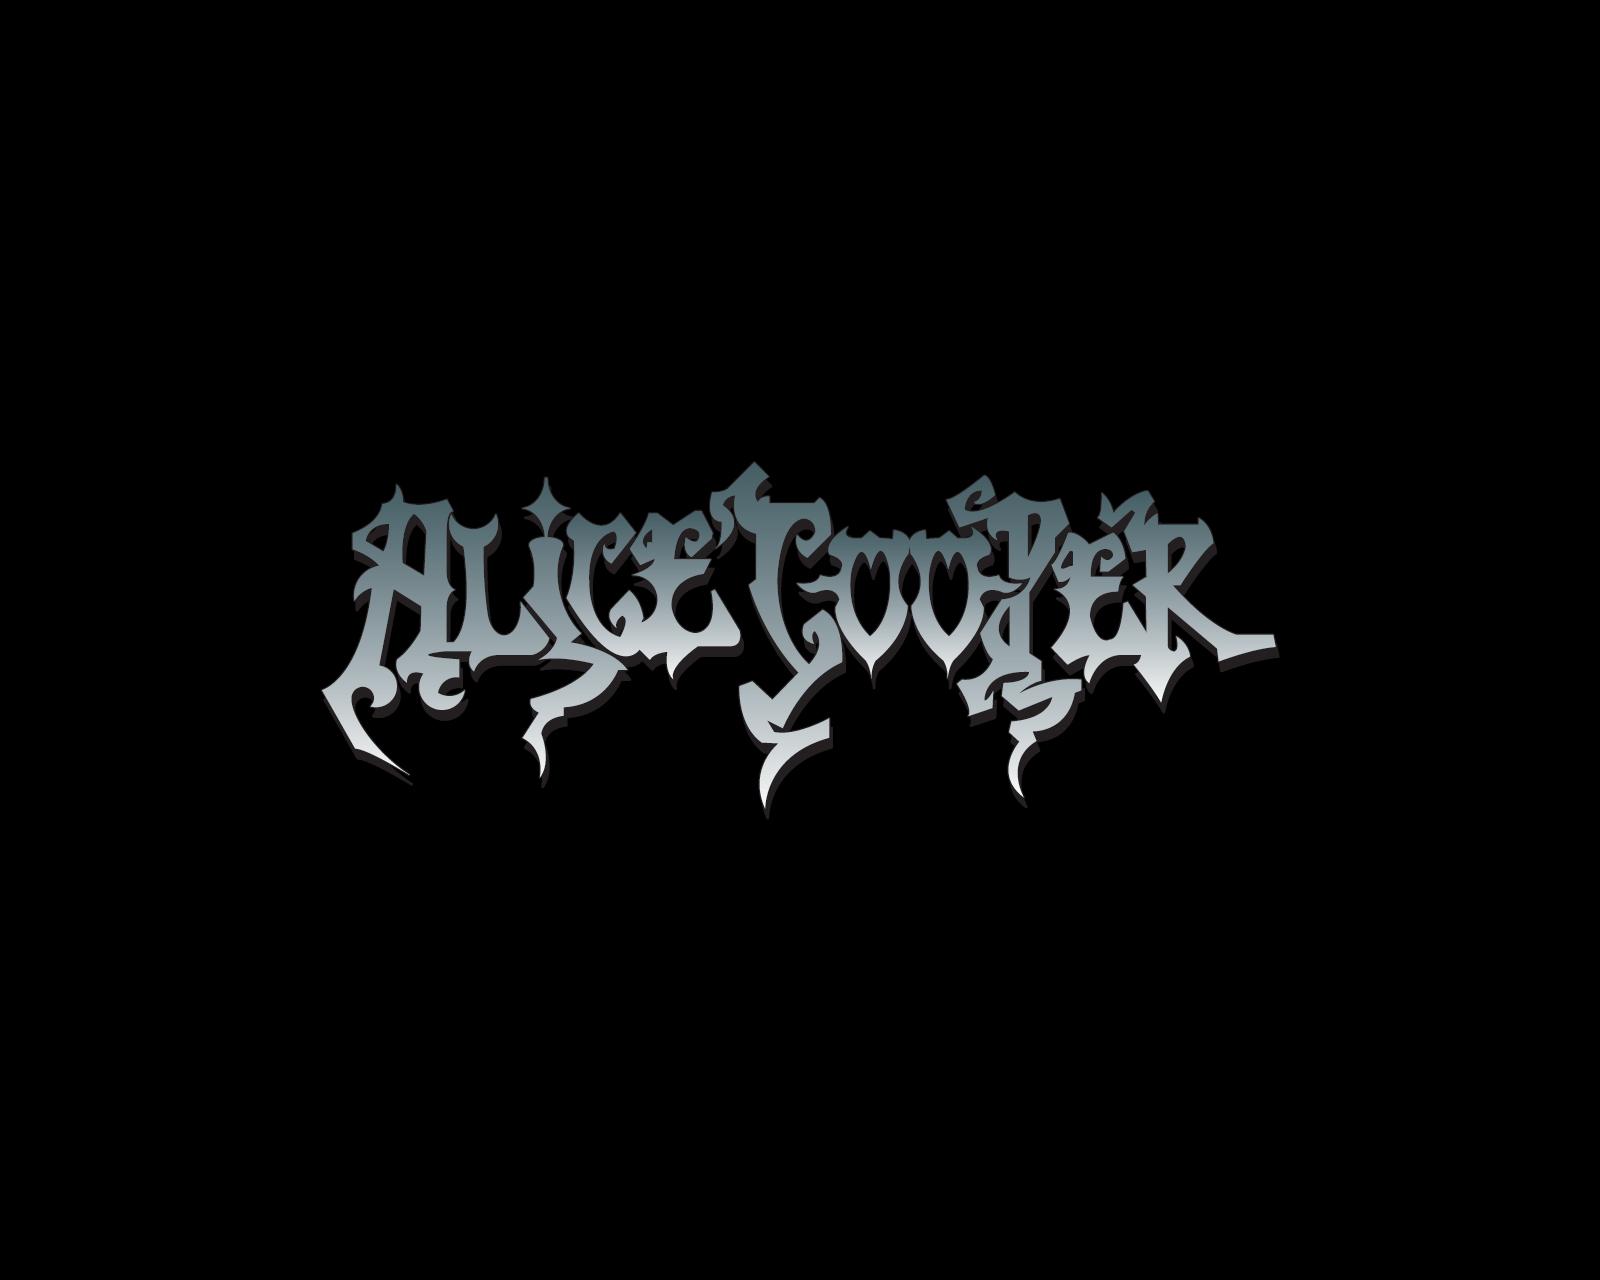 Alice Cooper HD Wallpapers Backgrounds Wallpaper